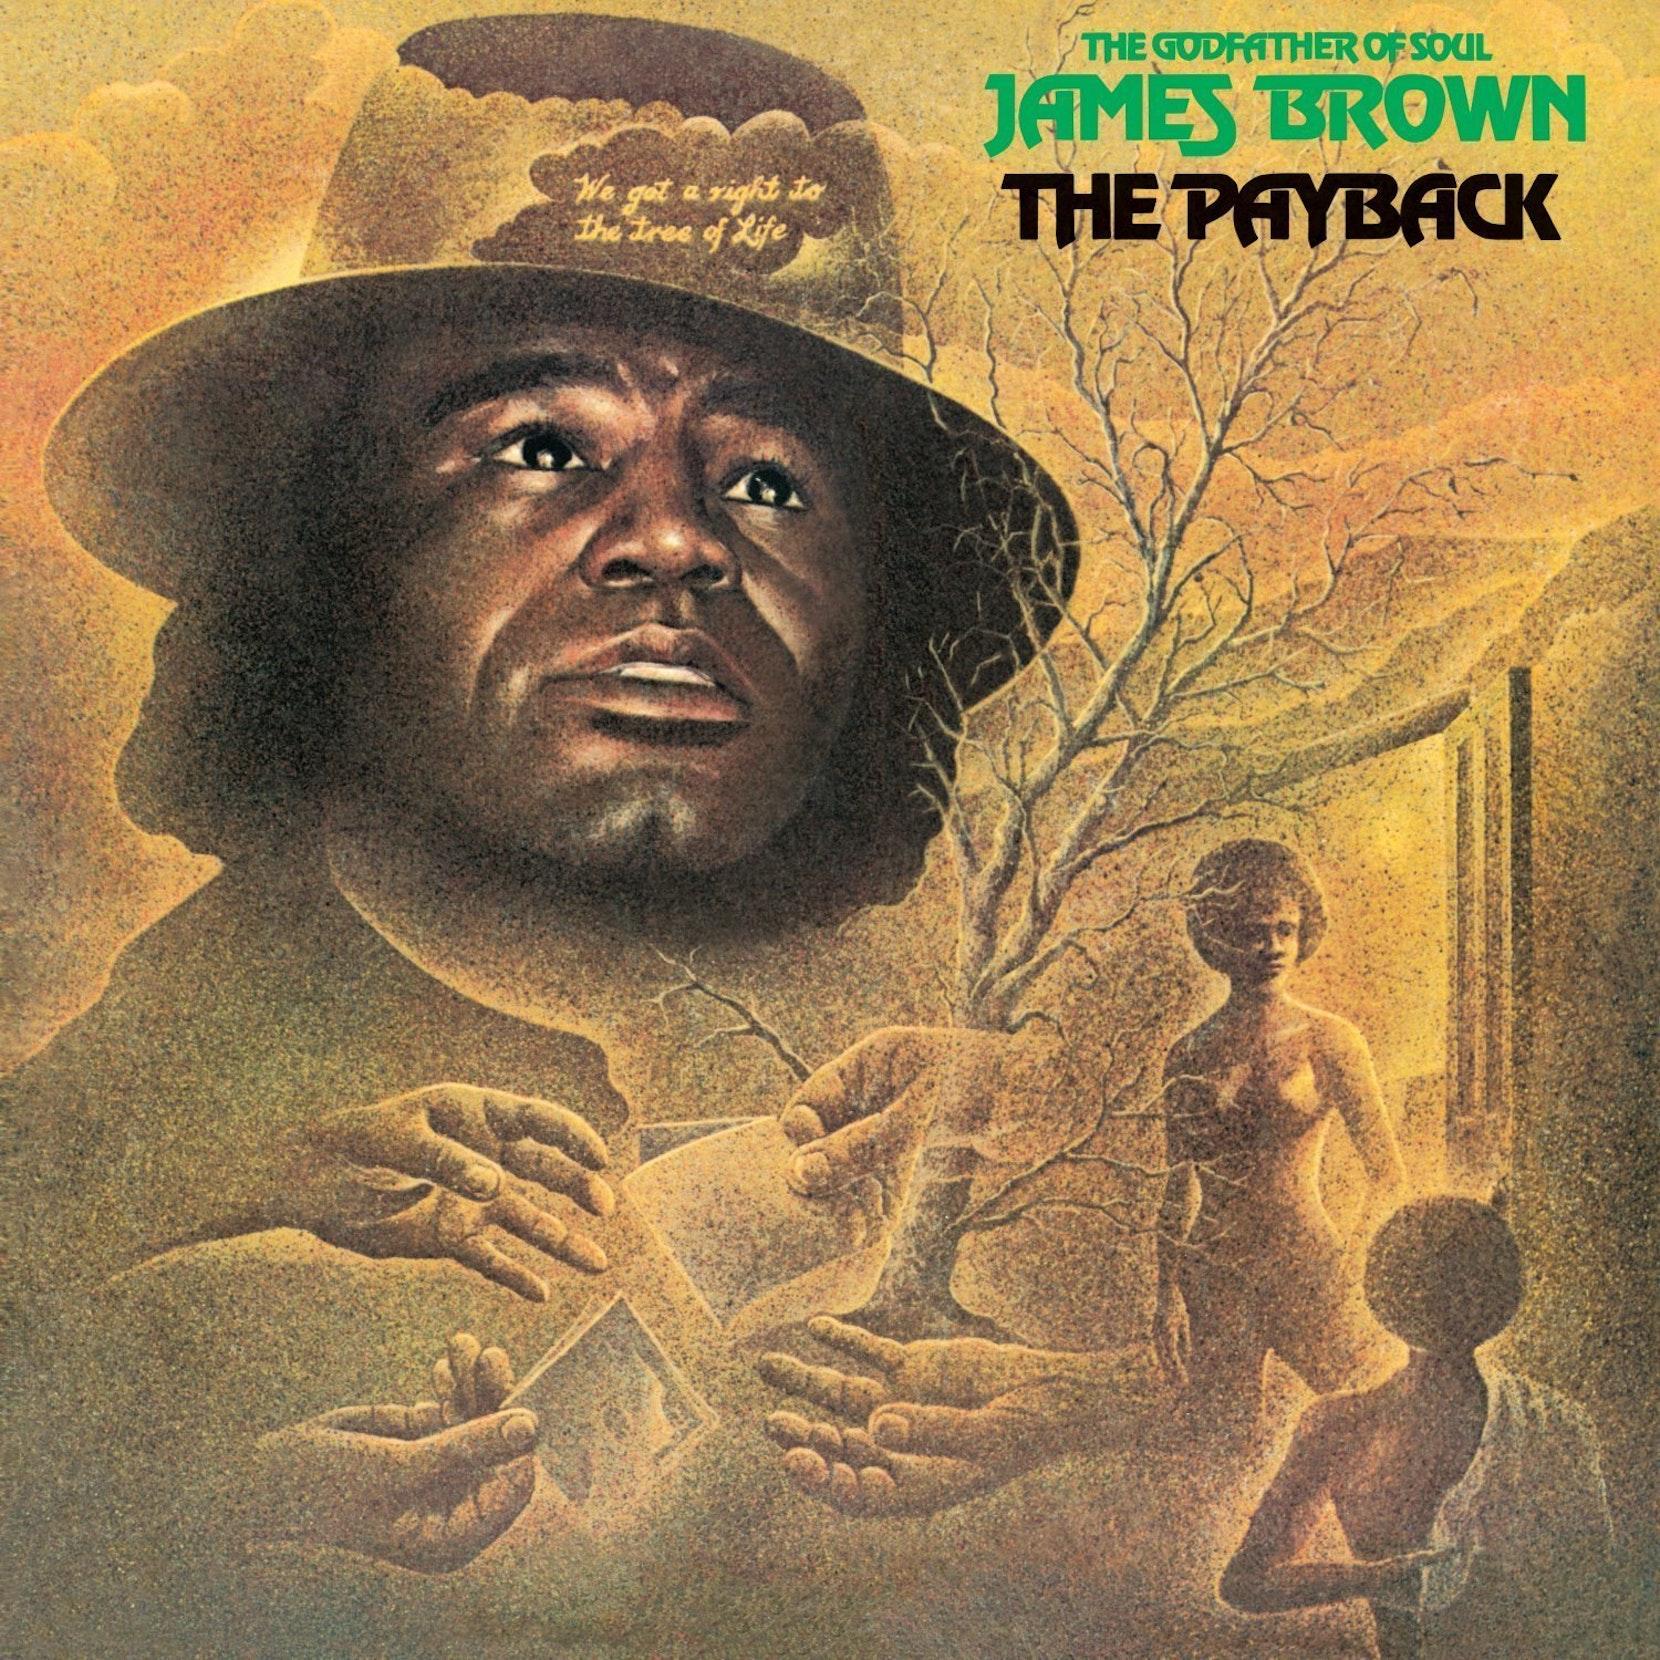 The 10 Best James Brown Albums To Own On Vinyl Vinyl Me